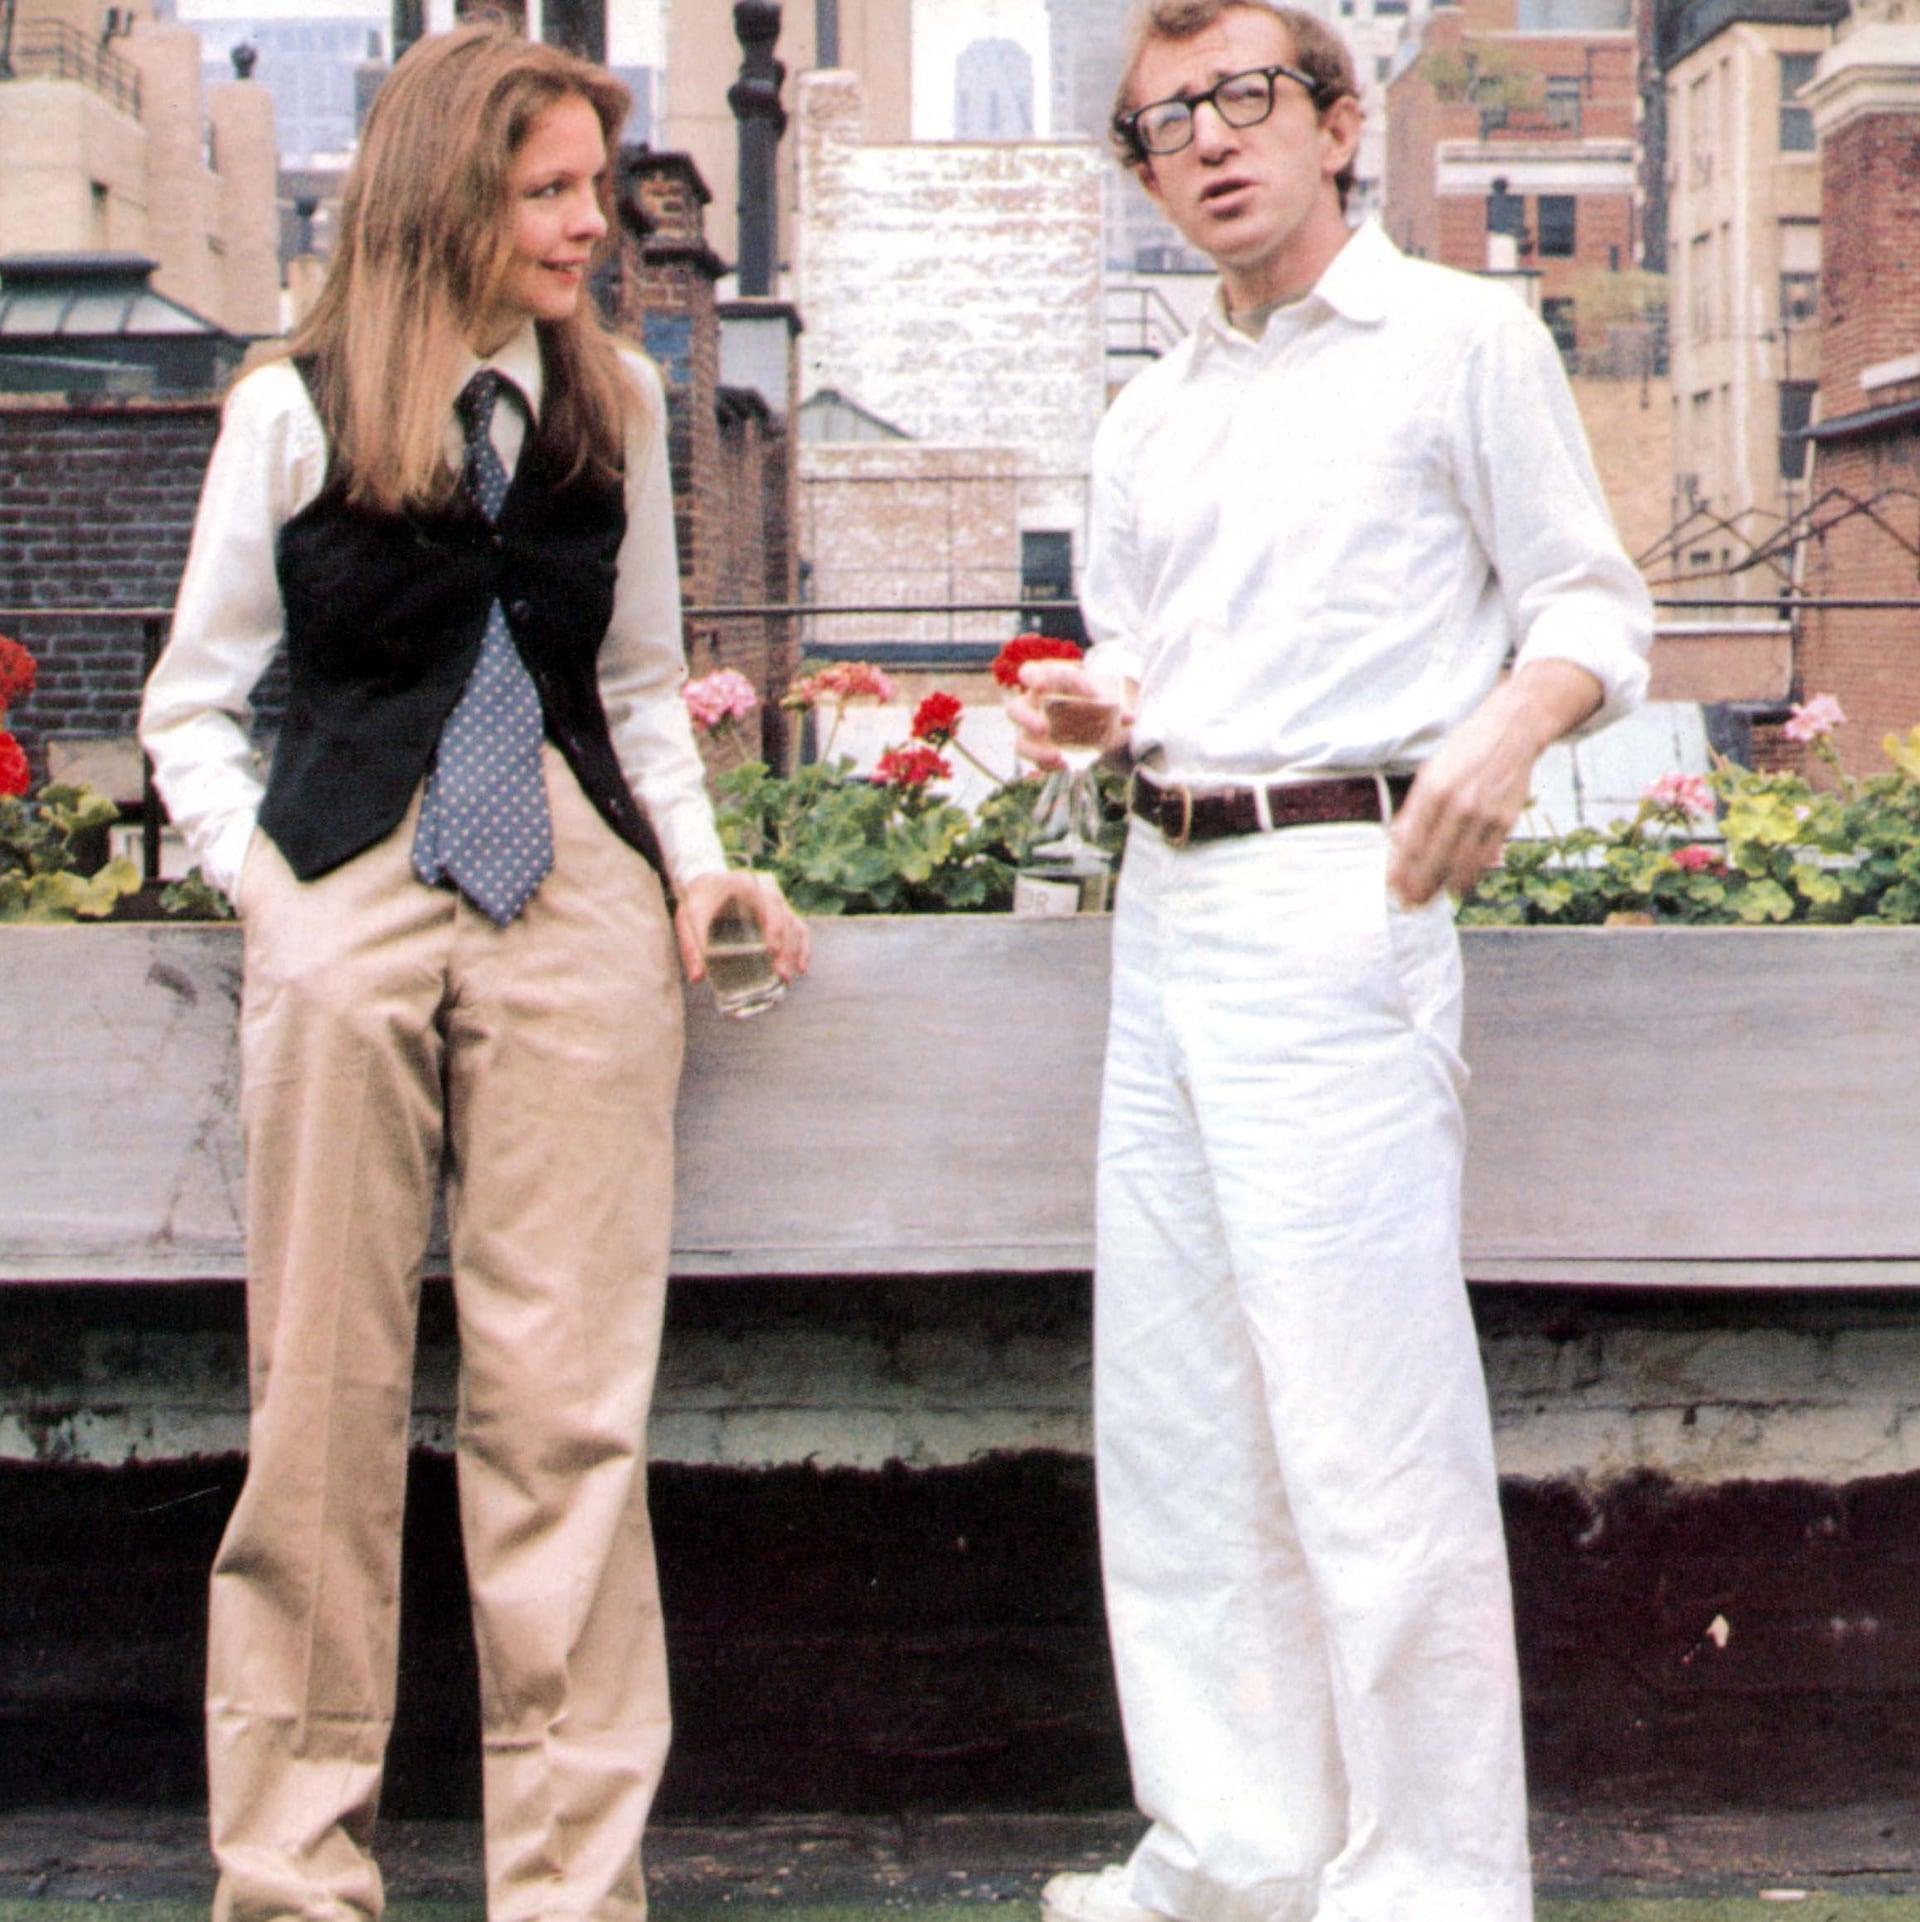 Crédit photo: telegraph.co.uk - Diane Keaton and Woody Allen